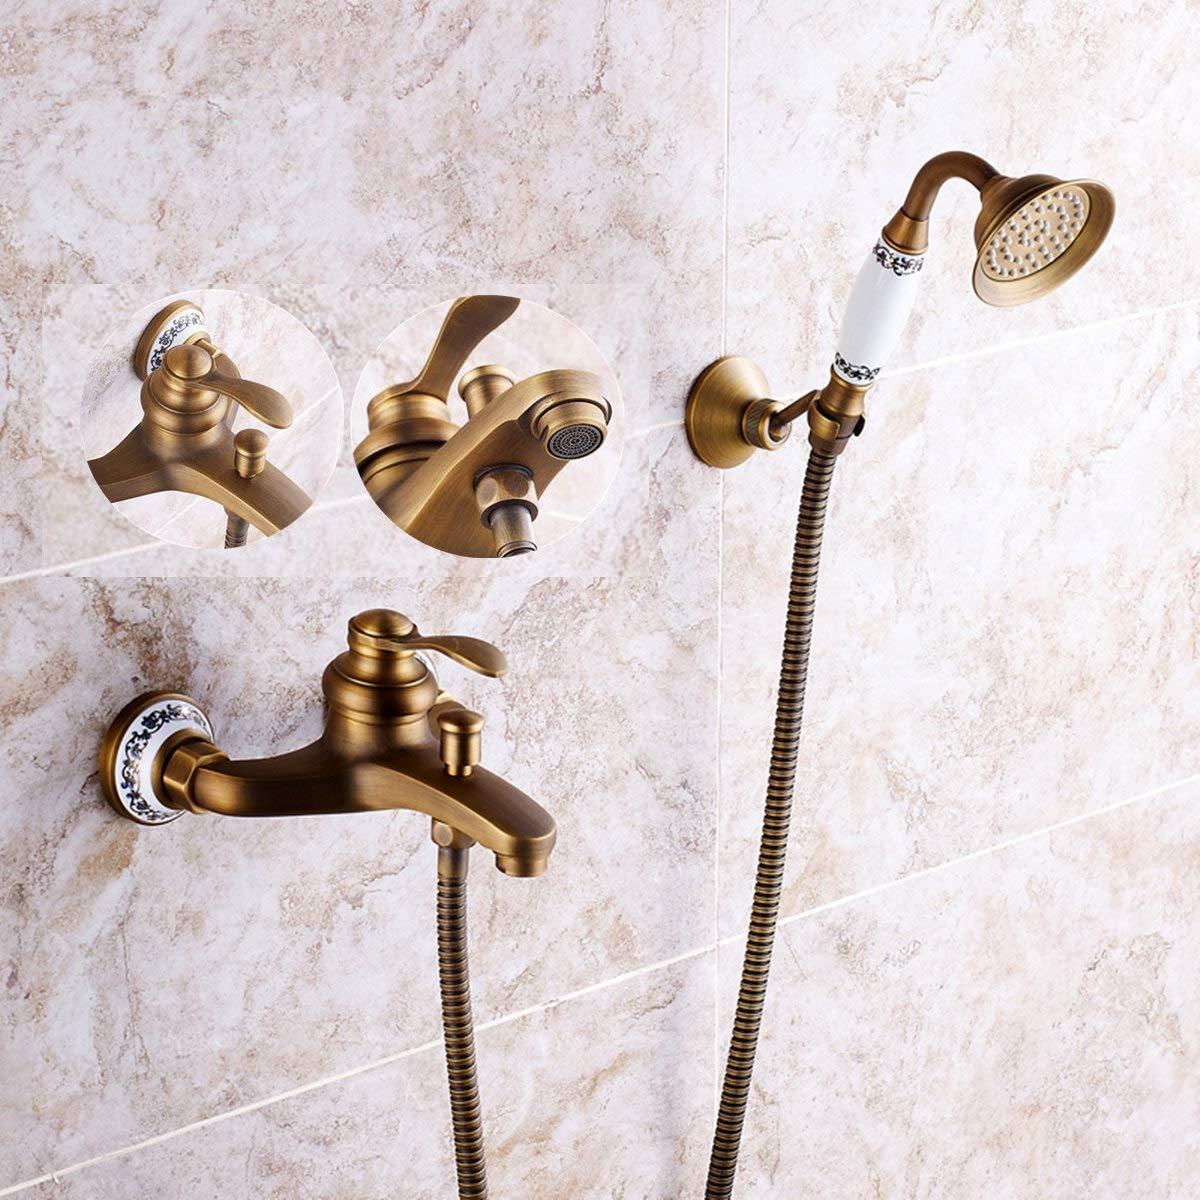 TANCHEN Antique Brass Shower Head Bathroom Tub Faucet Hand Held Tap Spray Waterfall Set